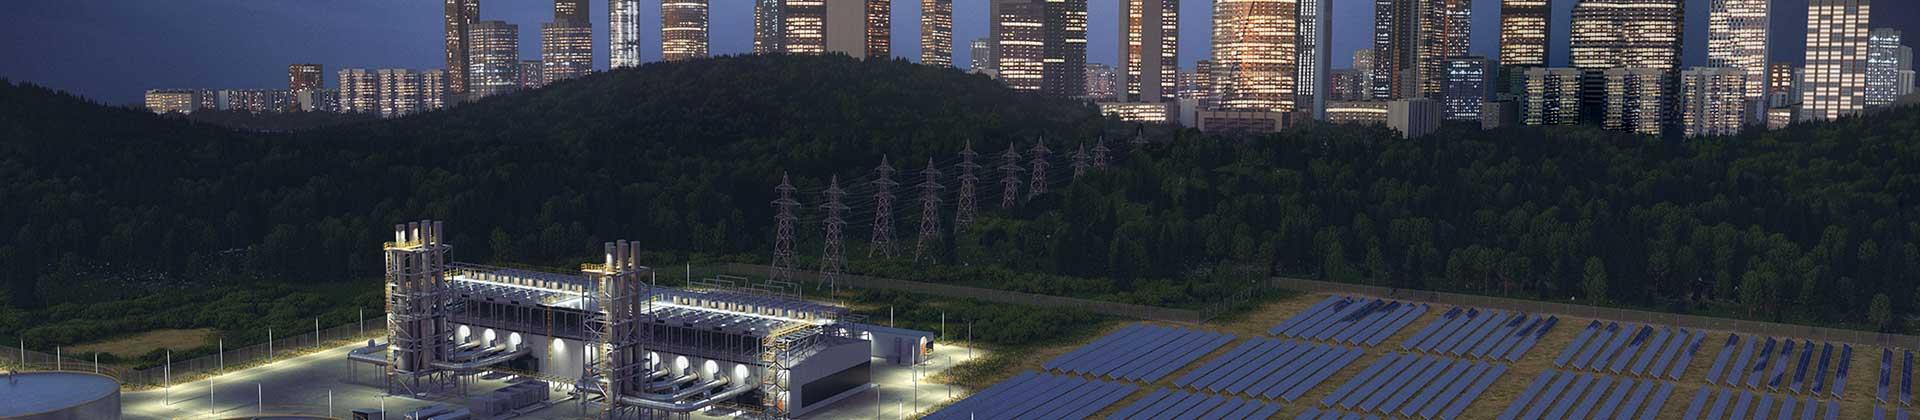 SmartEnergy-night-view